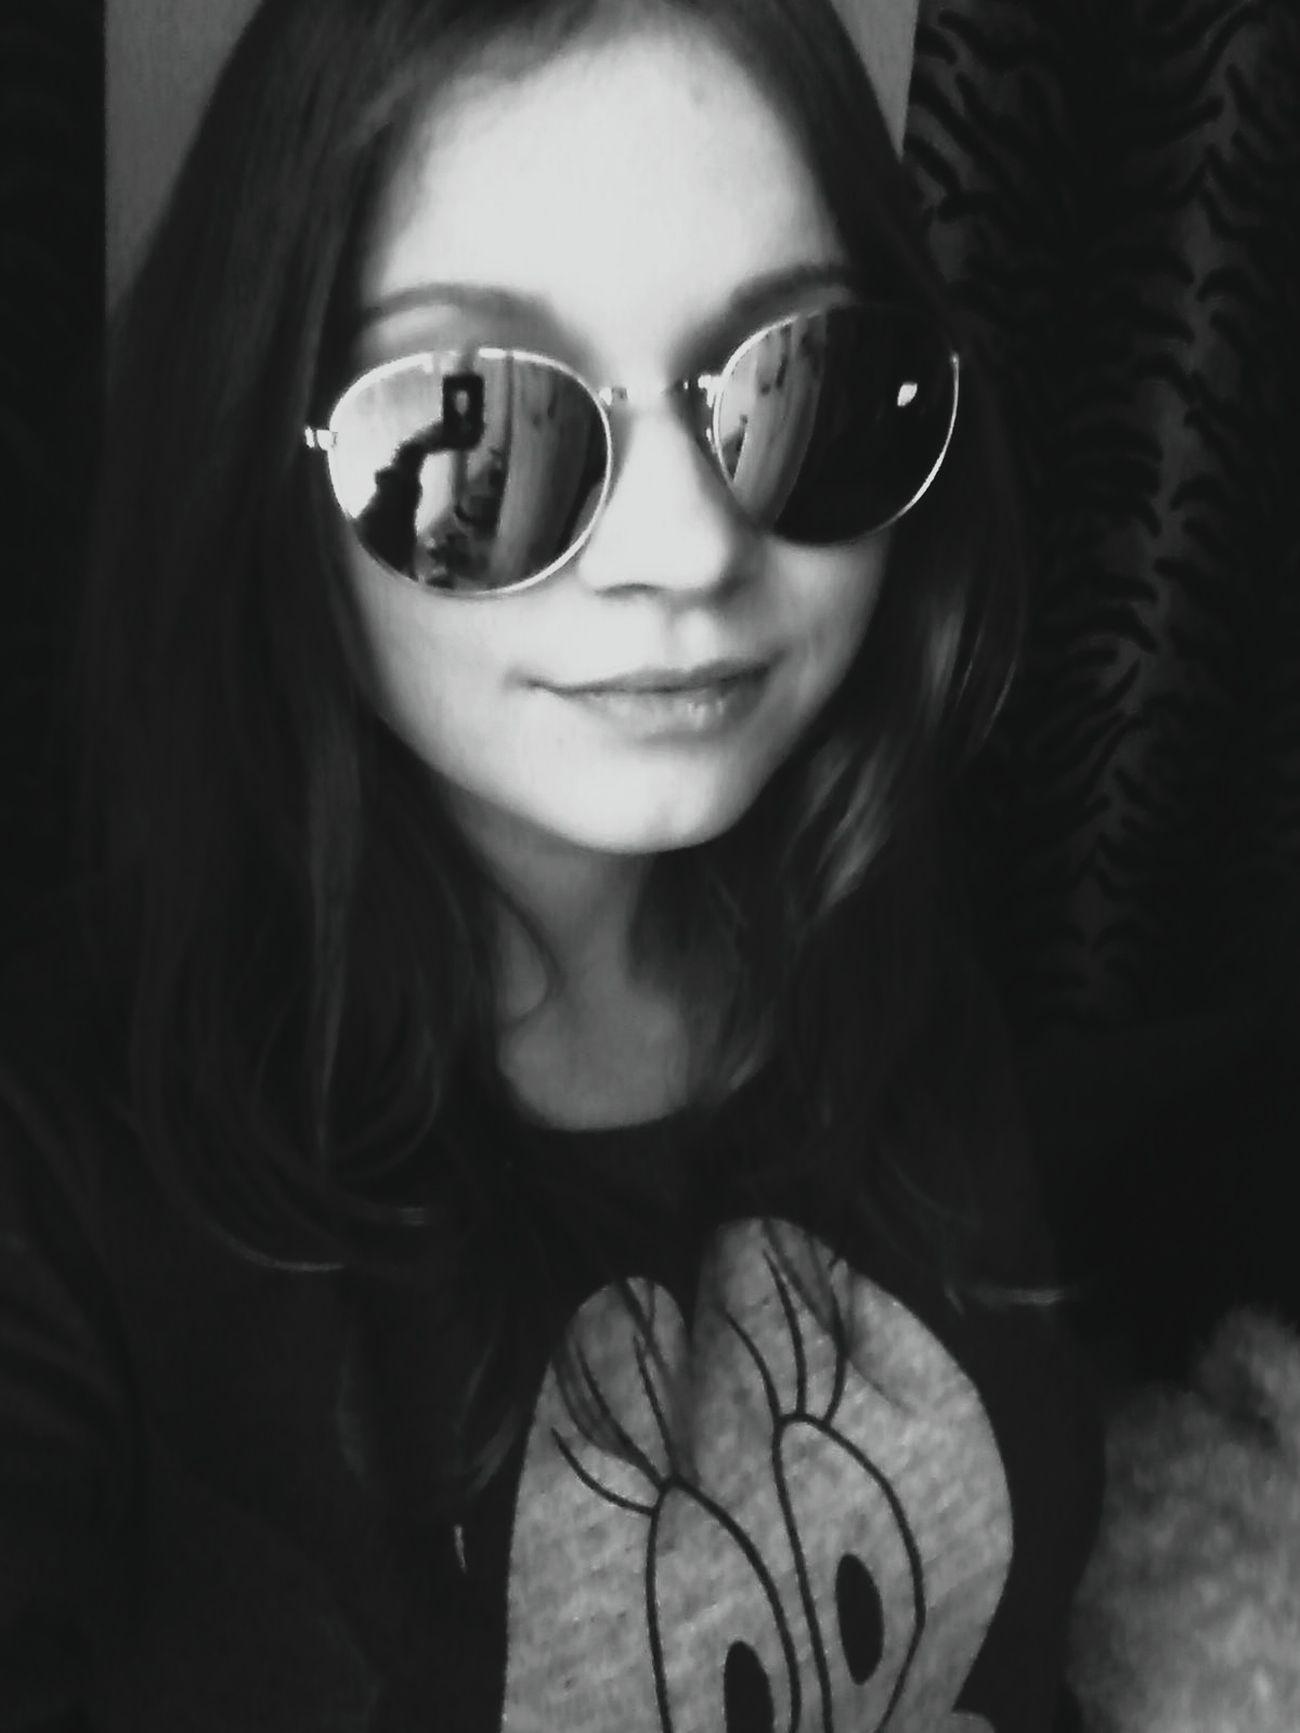 Girl Visaginas Lithuaniagirl Sunglasses Cute Black & White